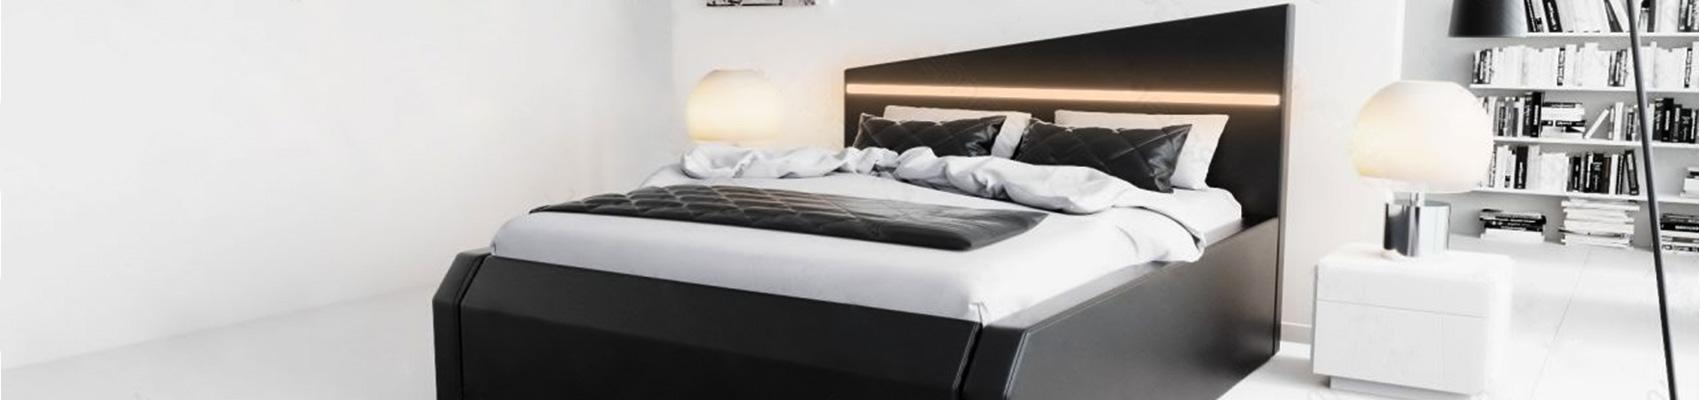 Boxspringbett Mit Beleuchtung | Boxspringbett Mit Beleuchtung Design Boxsprtingbetten Sofa Dreams